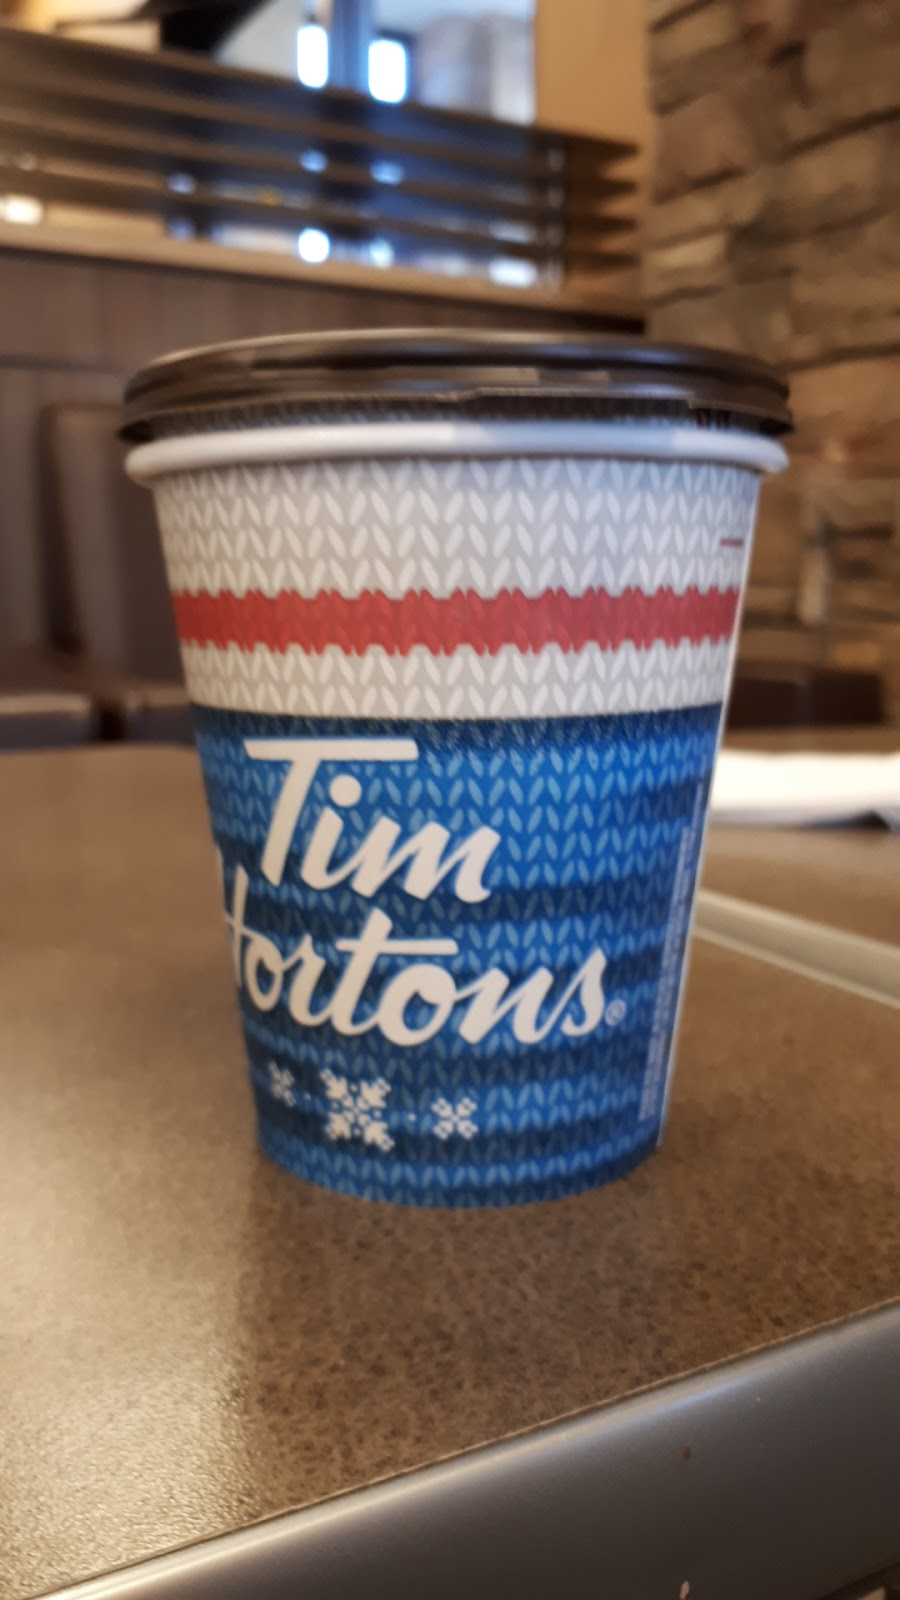 Tim Hortons | cafe | 14 Highfield Park Dr Unit 4, Dartmouth, NS B3A 4T6, Canada | 9024641084 OR +1 902-464-1084